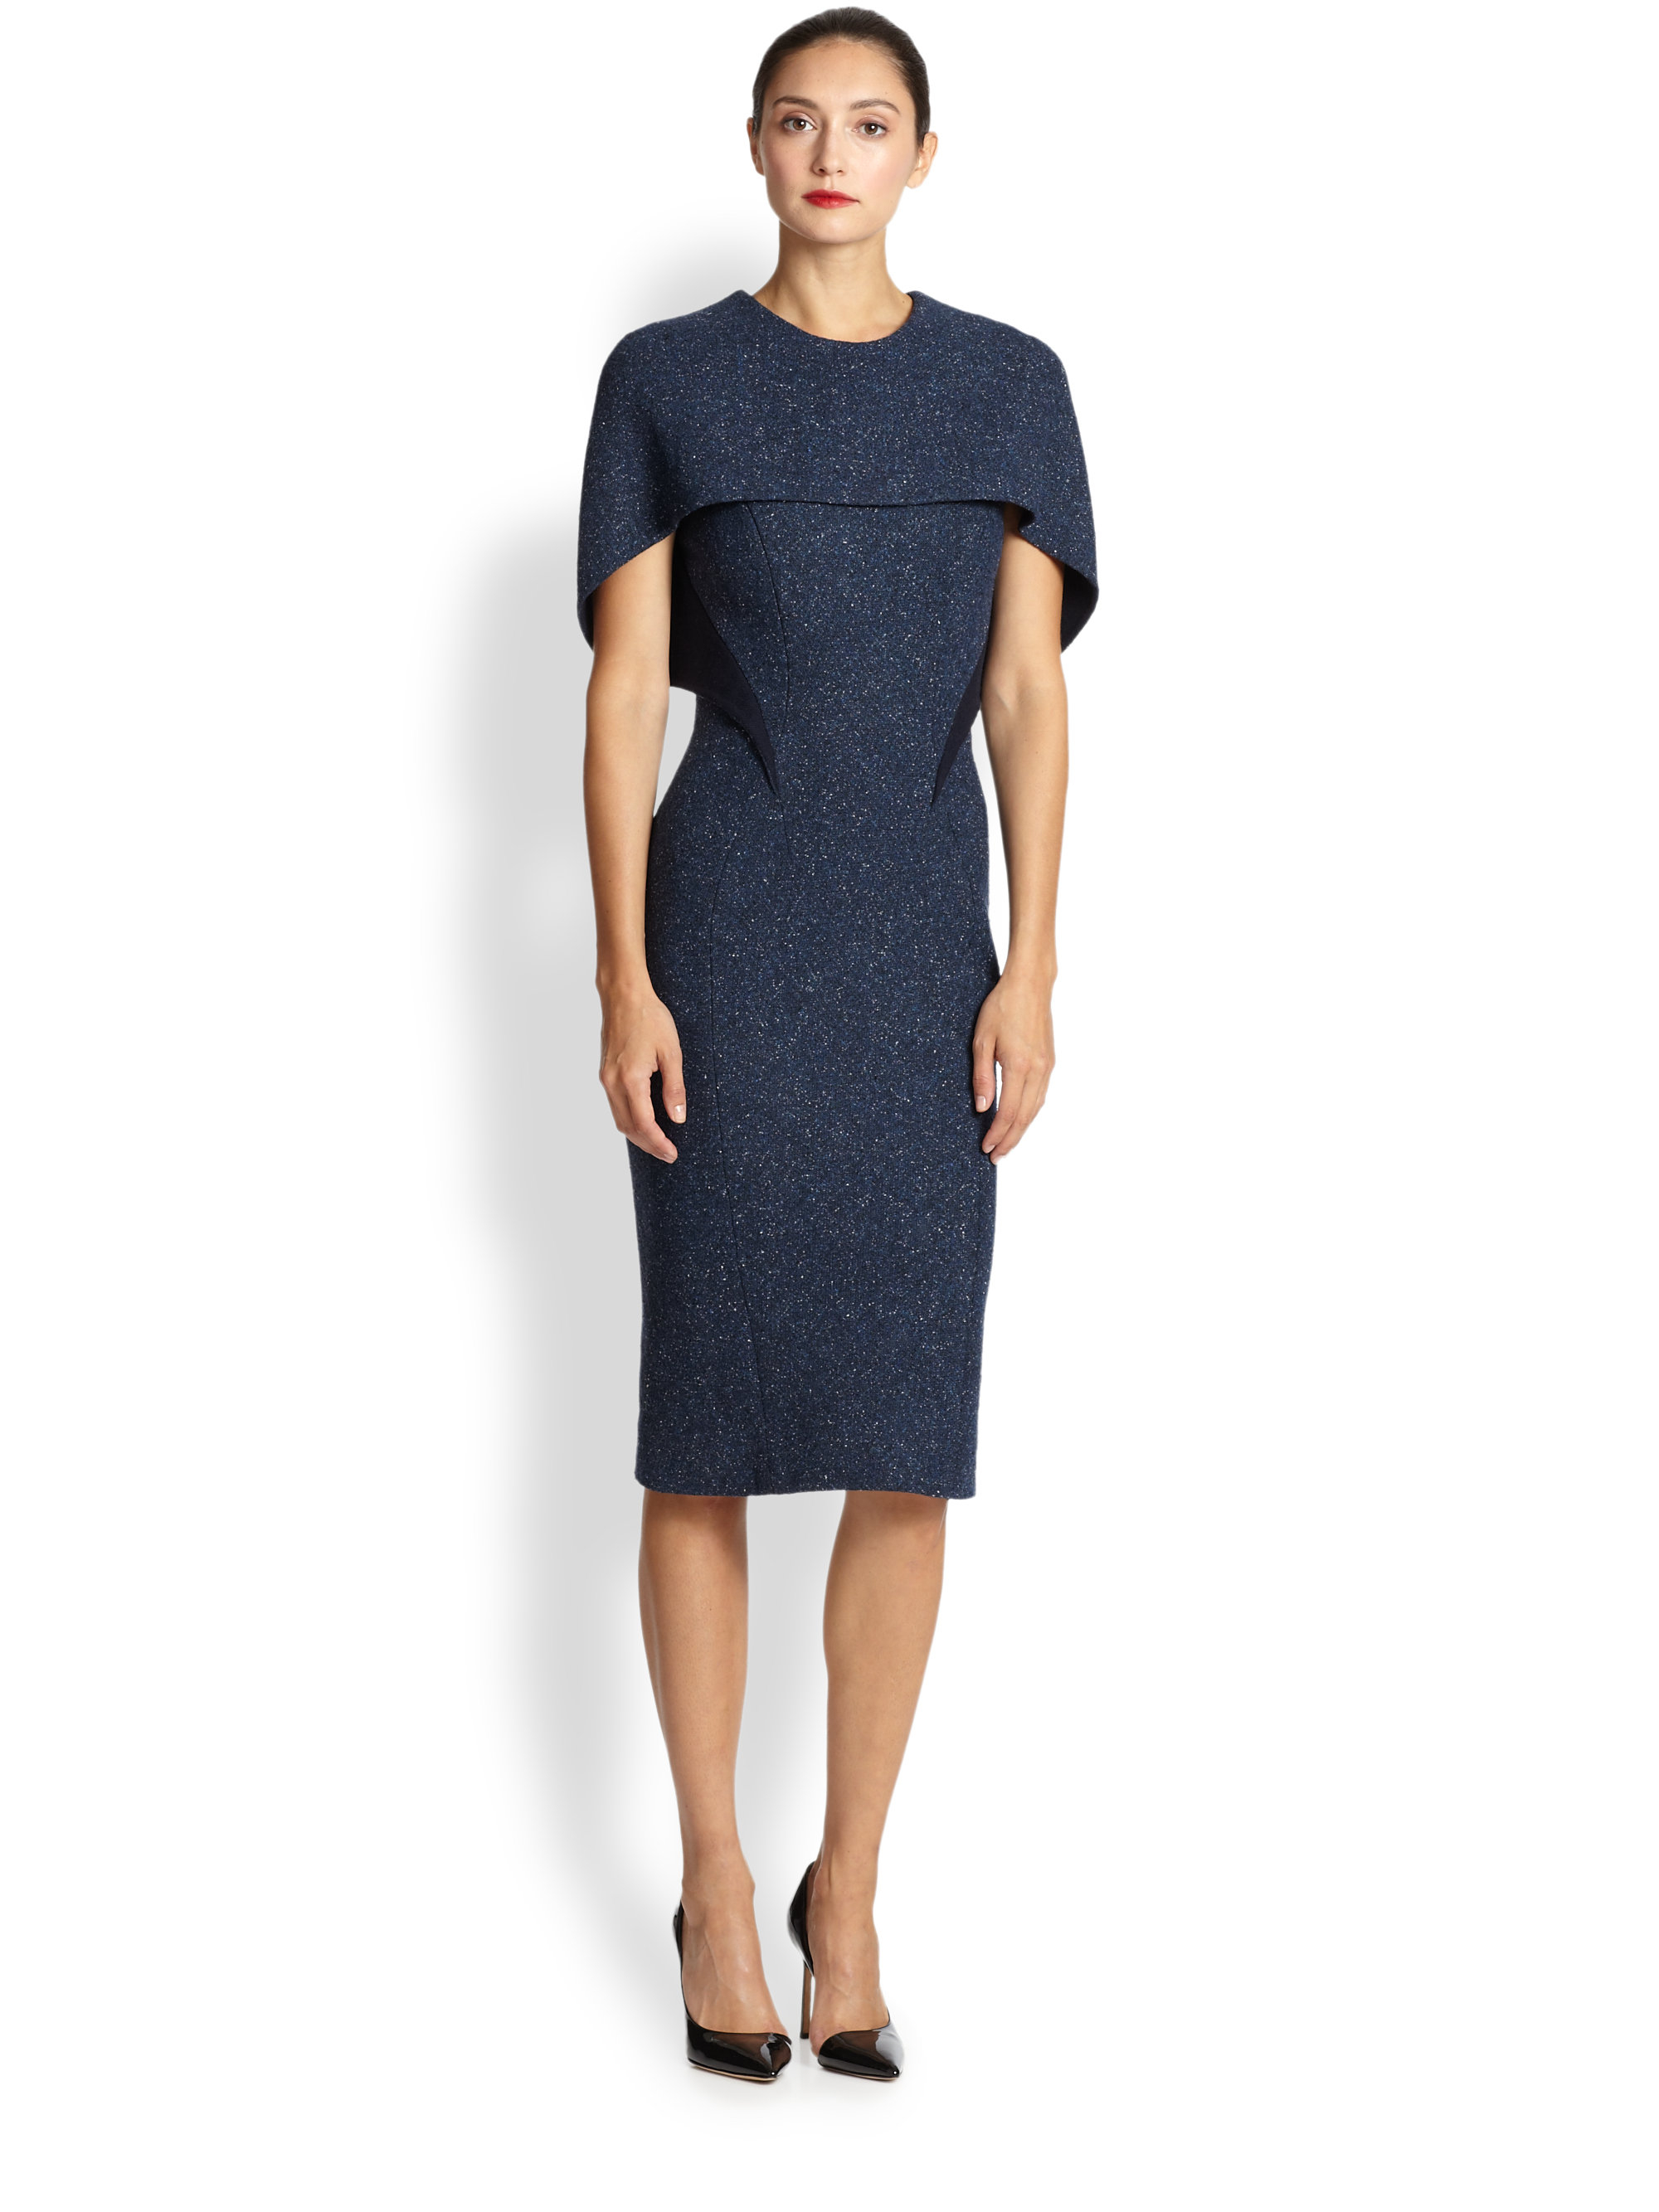 Zac posen Tweed Capelet Dress in Blue